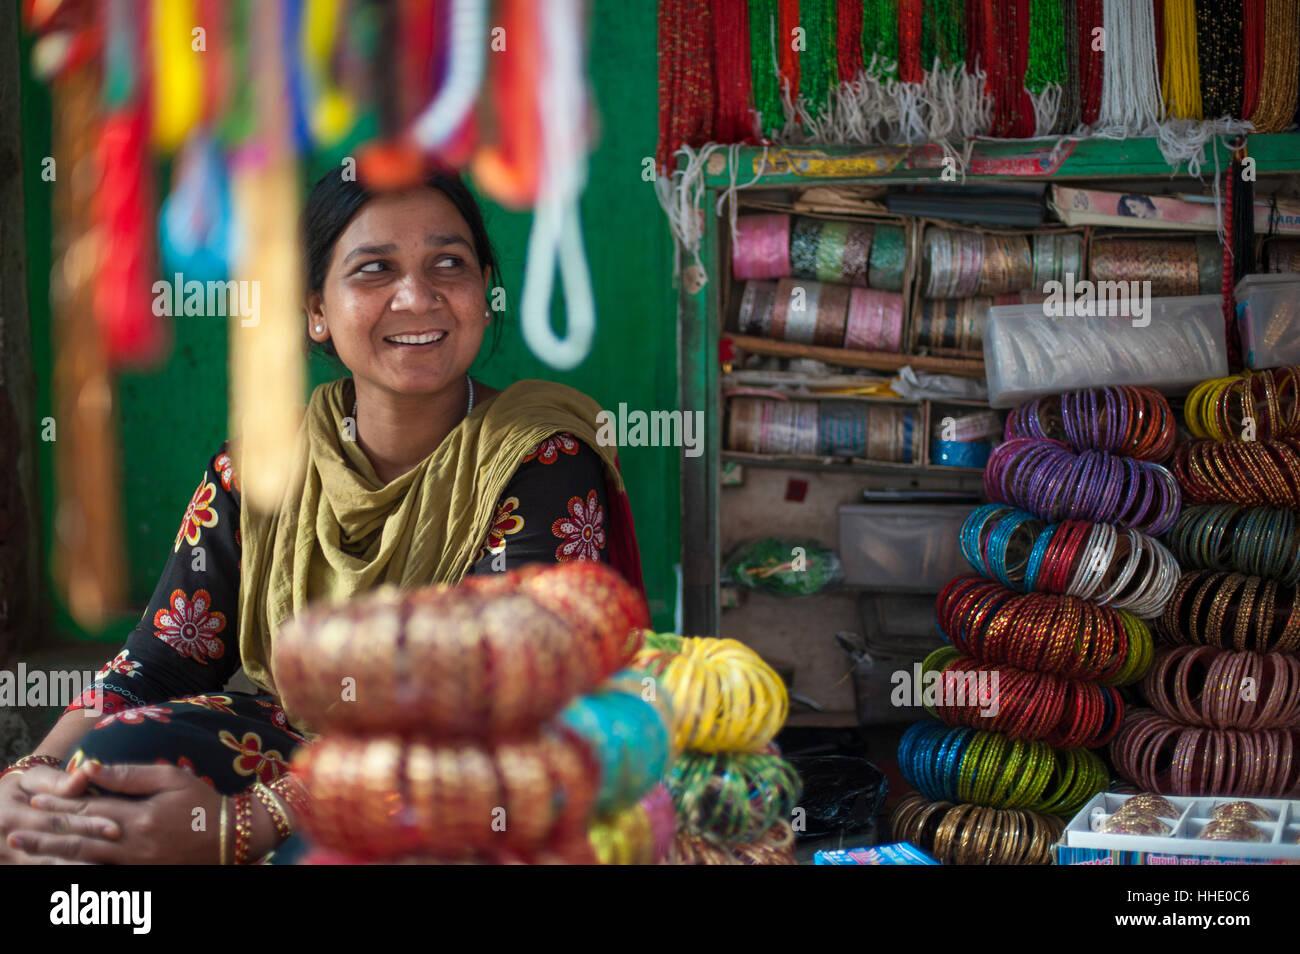 A bangle stall in Patan, an historical part of Kathmandu, Nepal - Stock Image